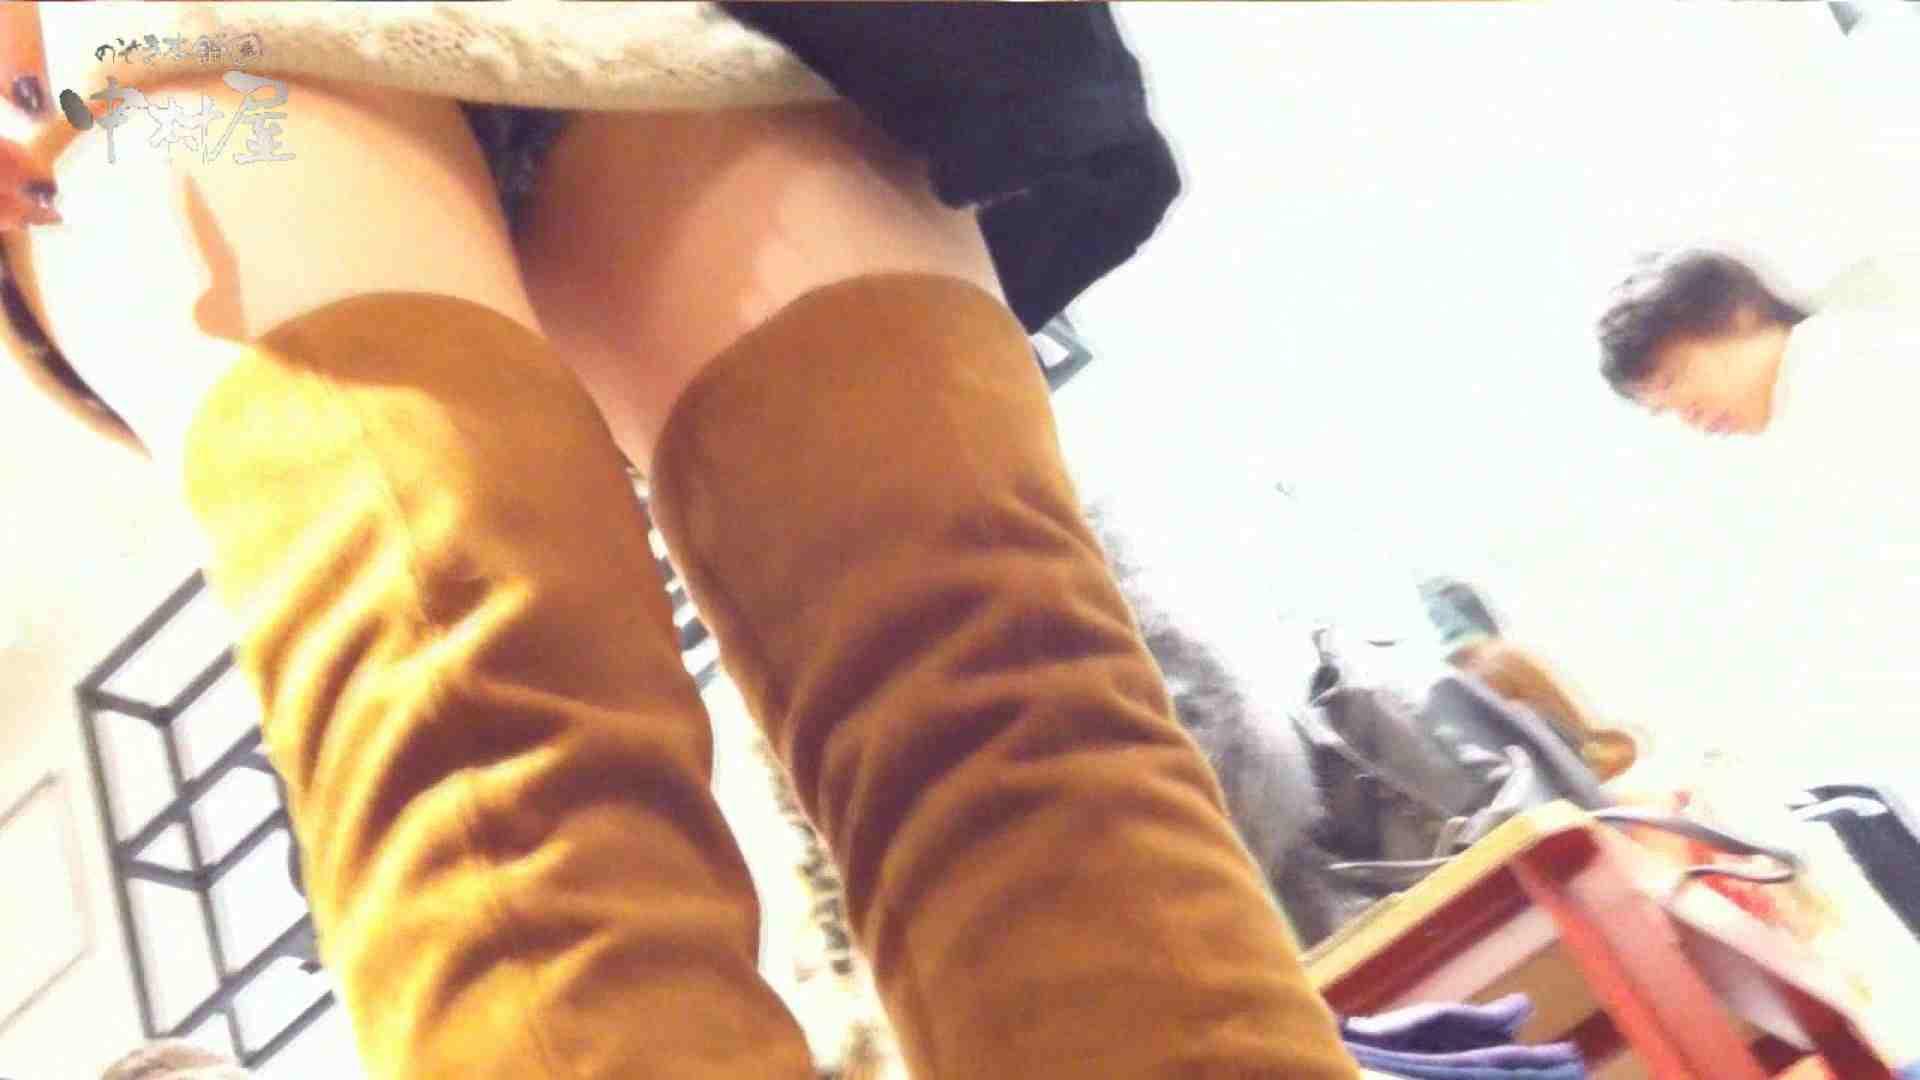 vol.85 美人アパレル胸チラ&パンチラ そそる唇の店員さん 接写 AV動画キャプチャ 97pic 58